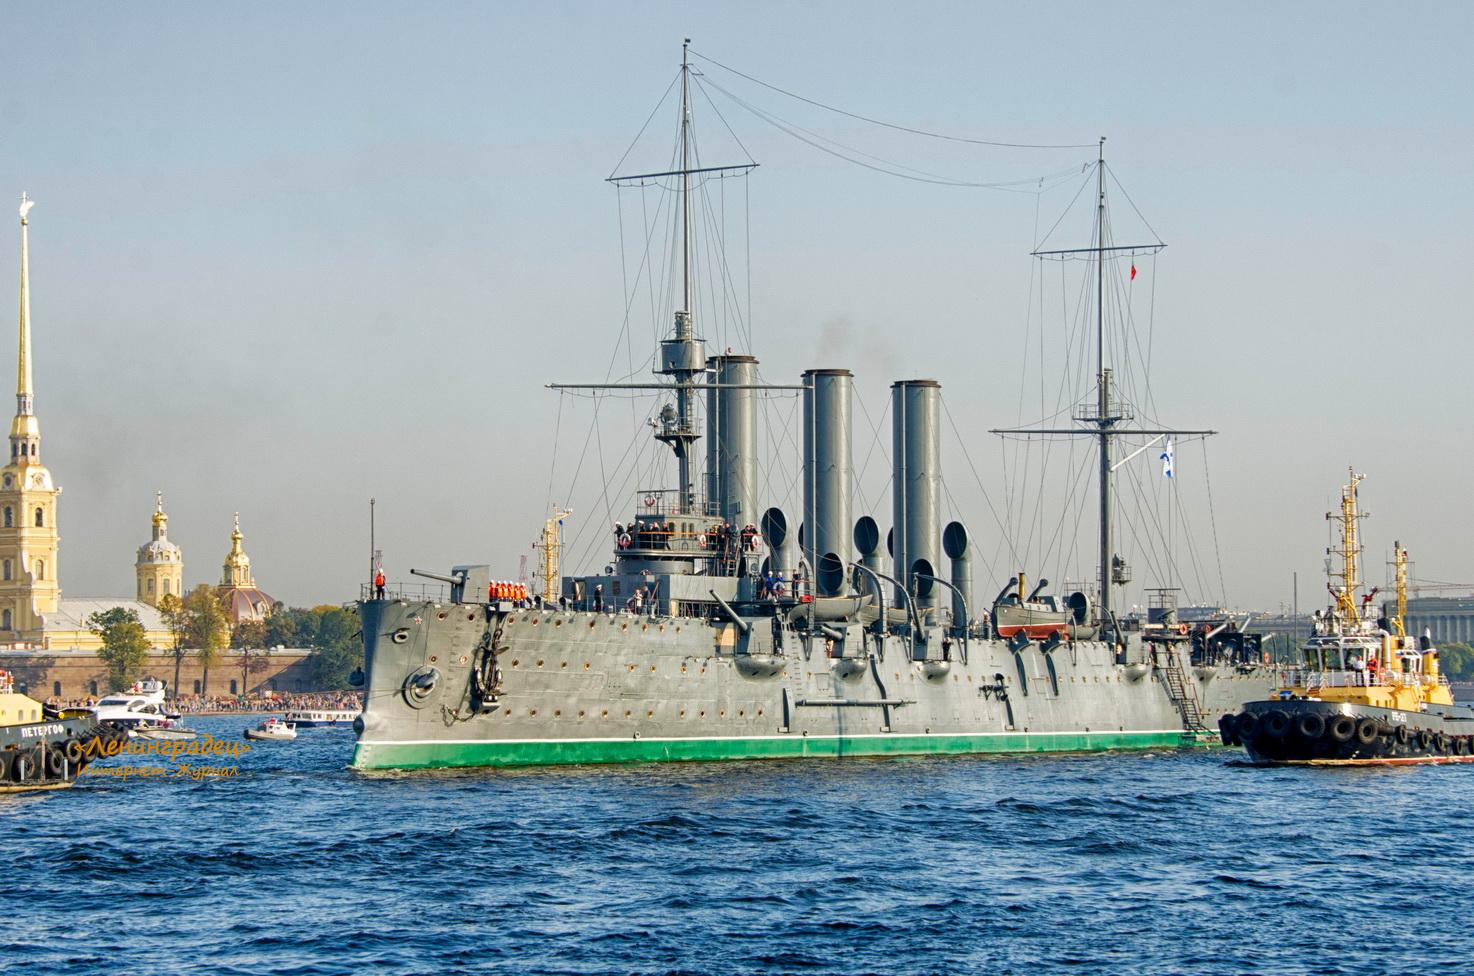 sea_Aurora_cruiser_2014_09_21_to_Kronshtadt_Morzavod_LJ_periskop_08_Petropavlovka_http_news-piter_ru